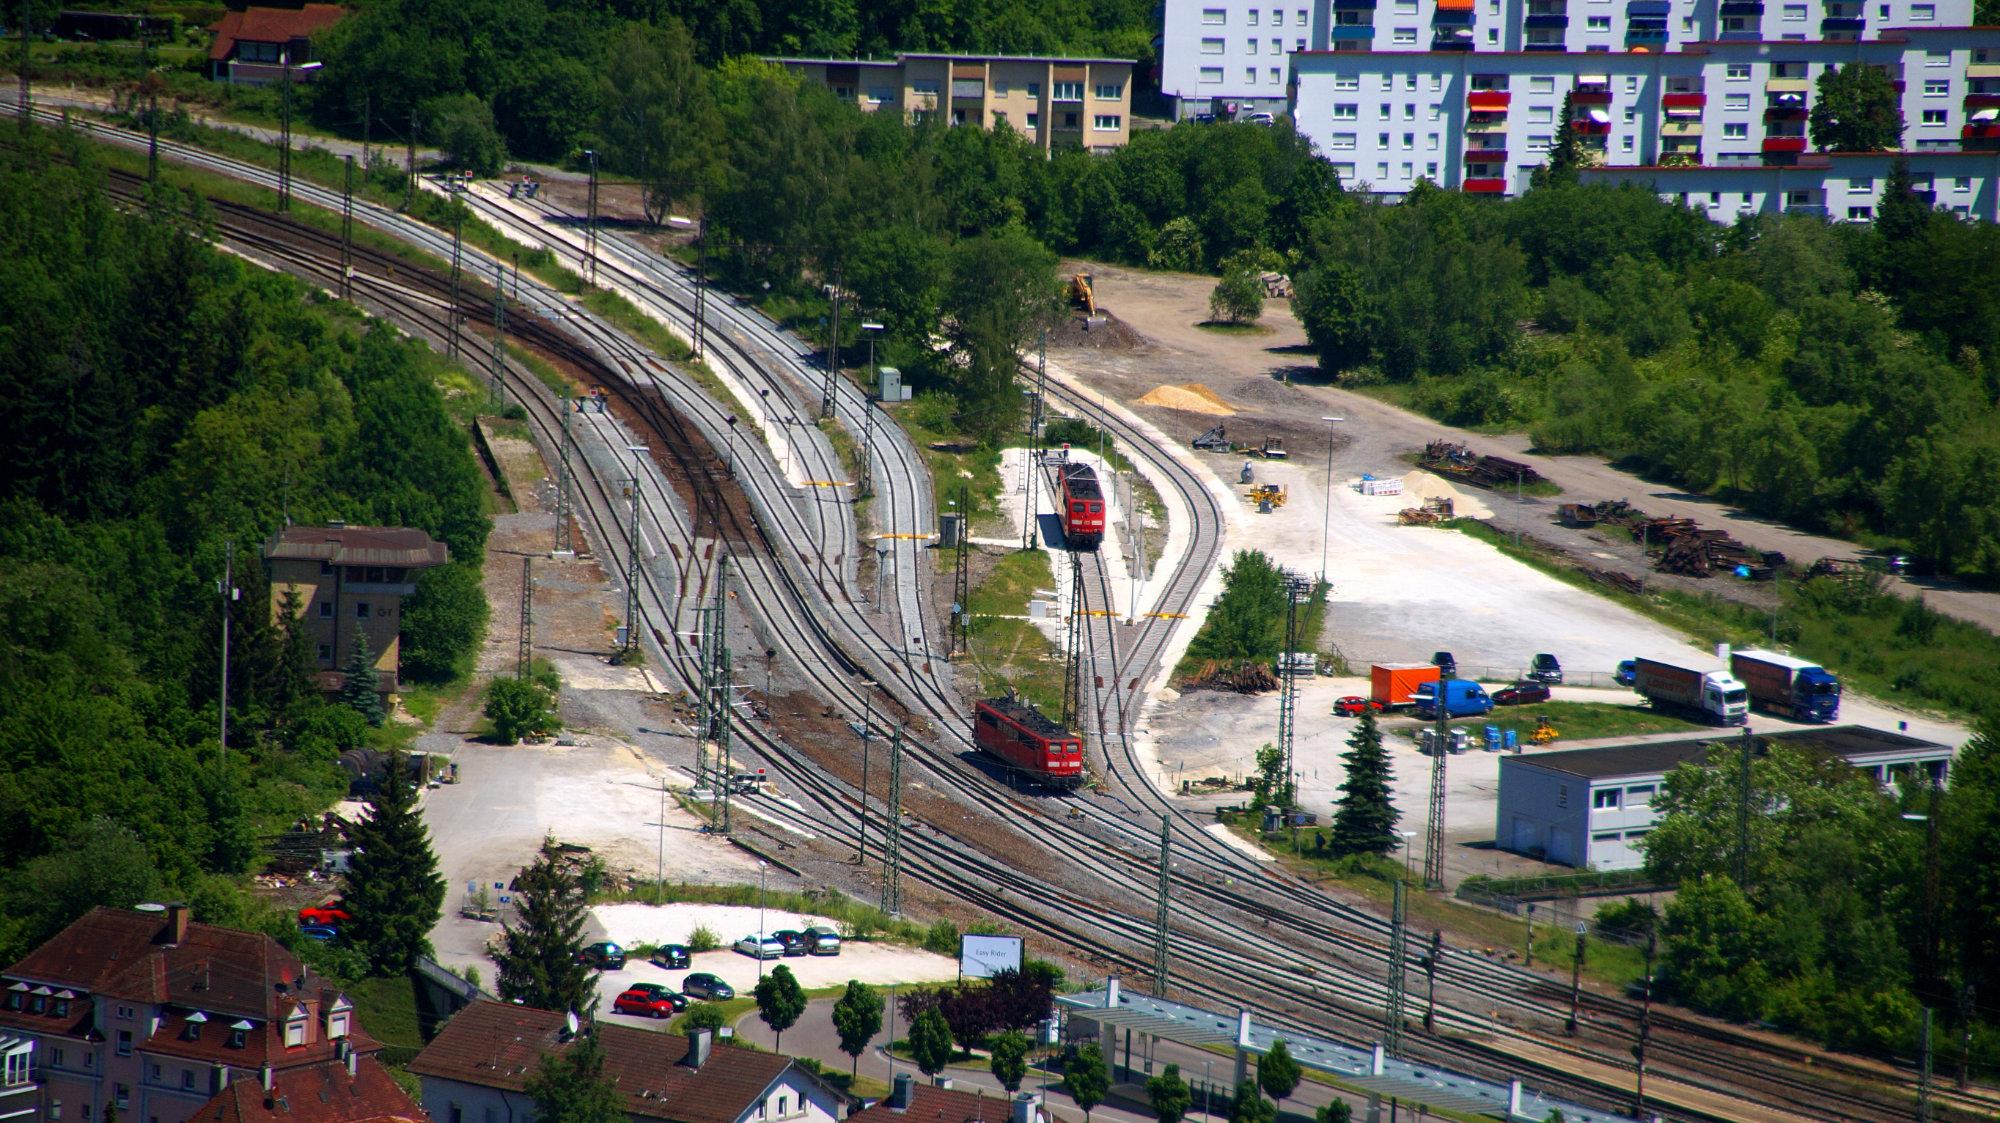 Bahnhof Geislingen